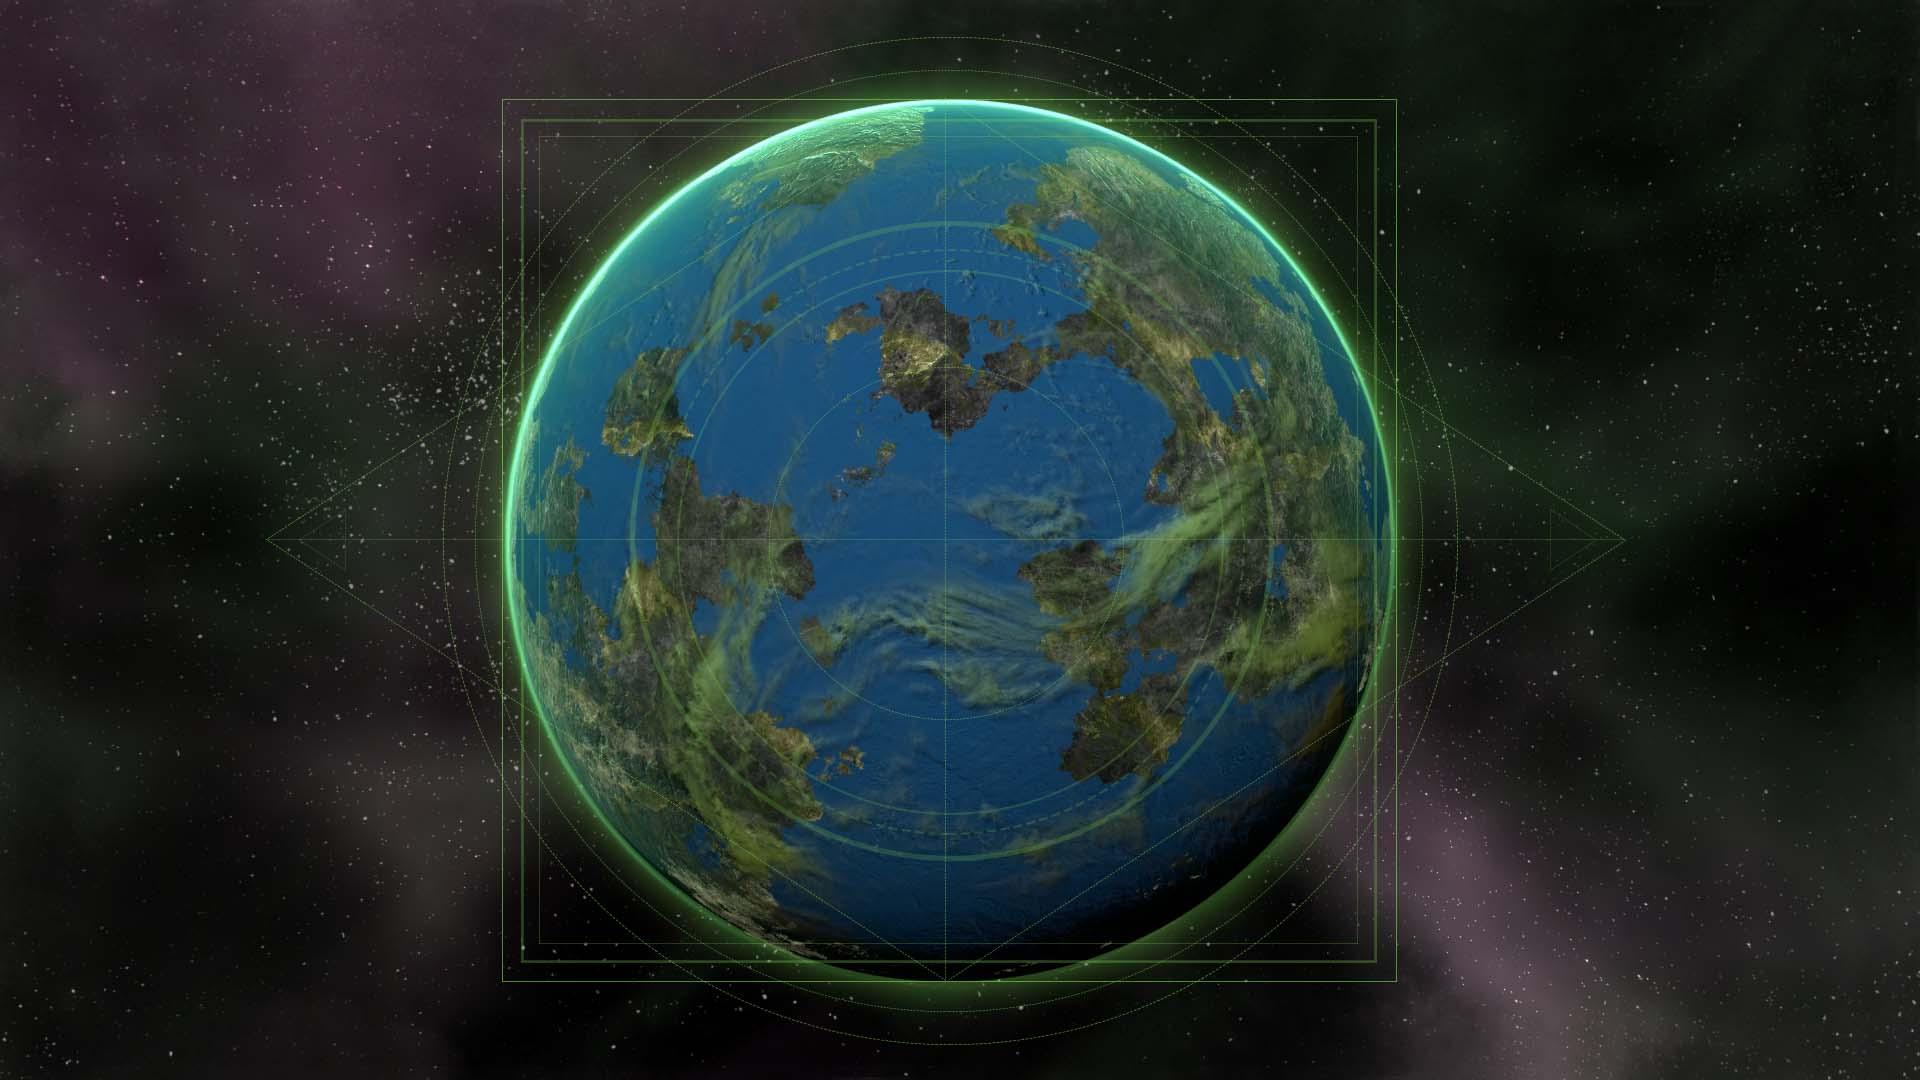 alpha centauri planets - HD1920×1080